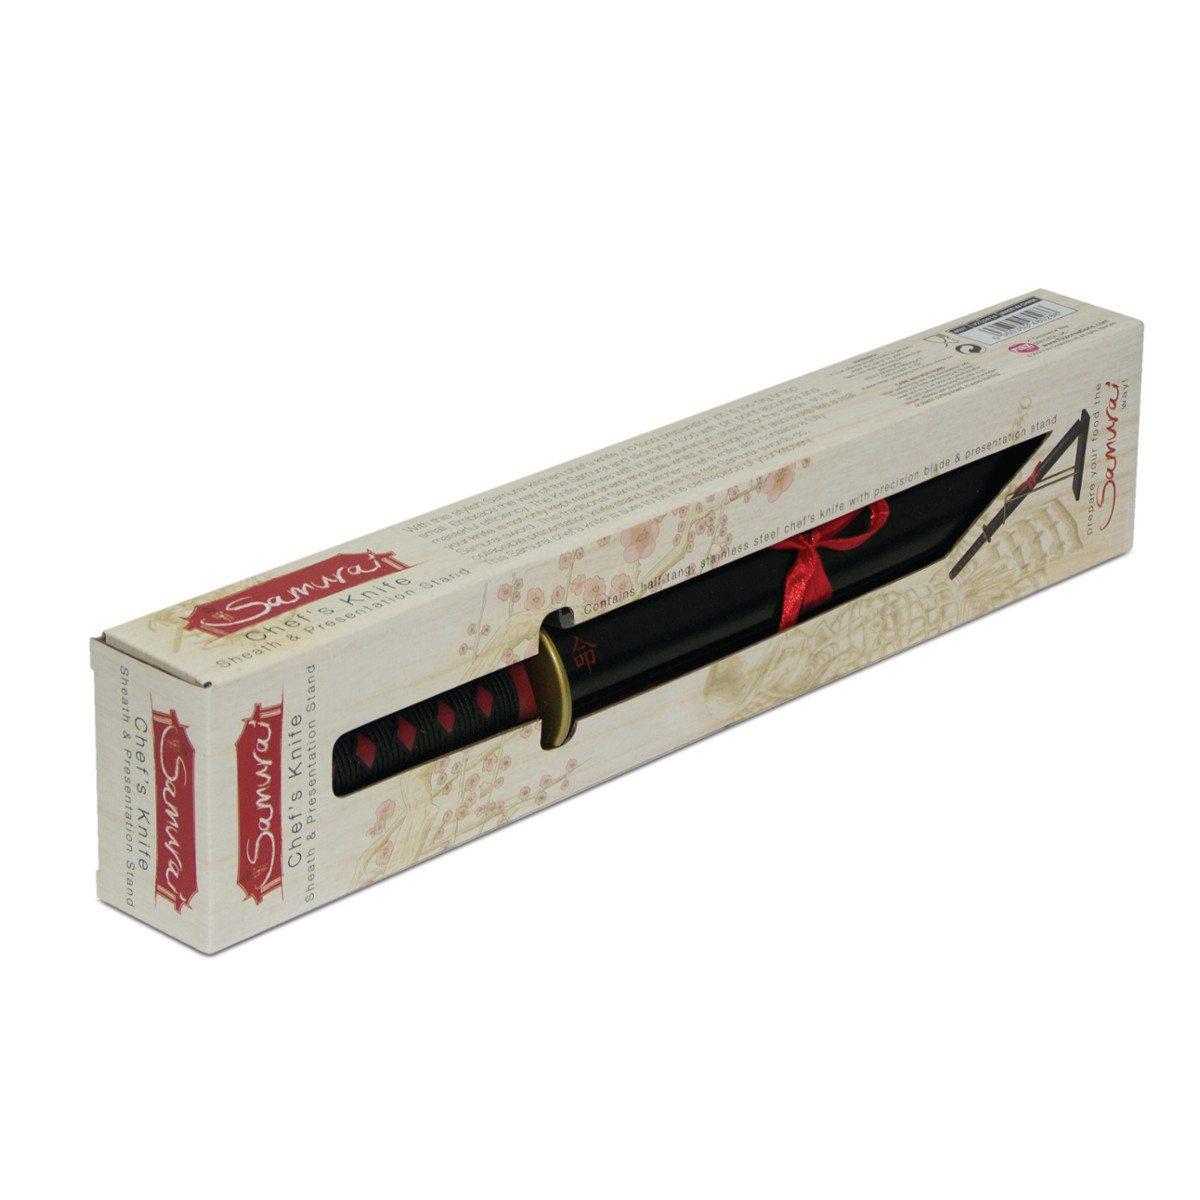 Køkkenkniv formet som samurai-sværd